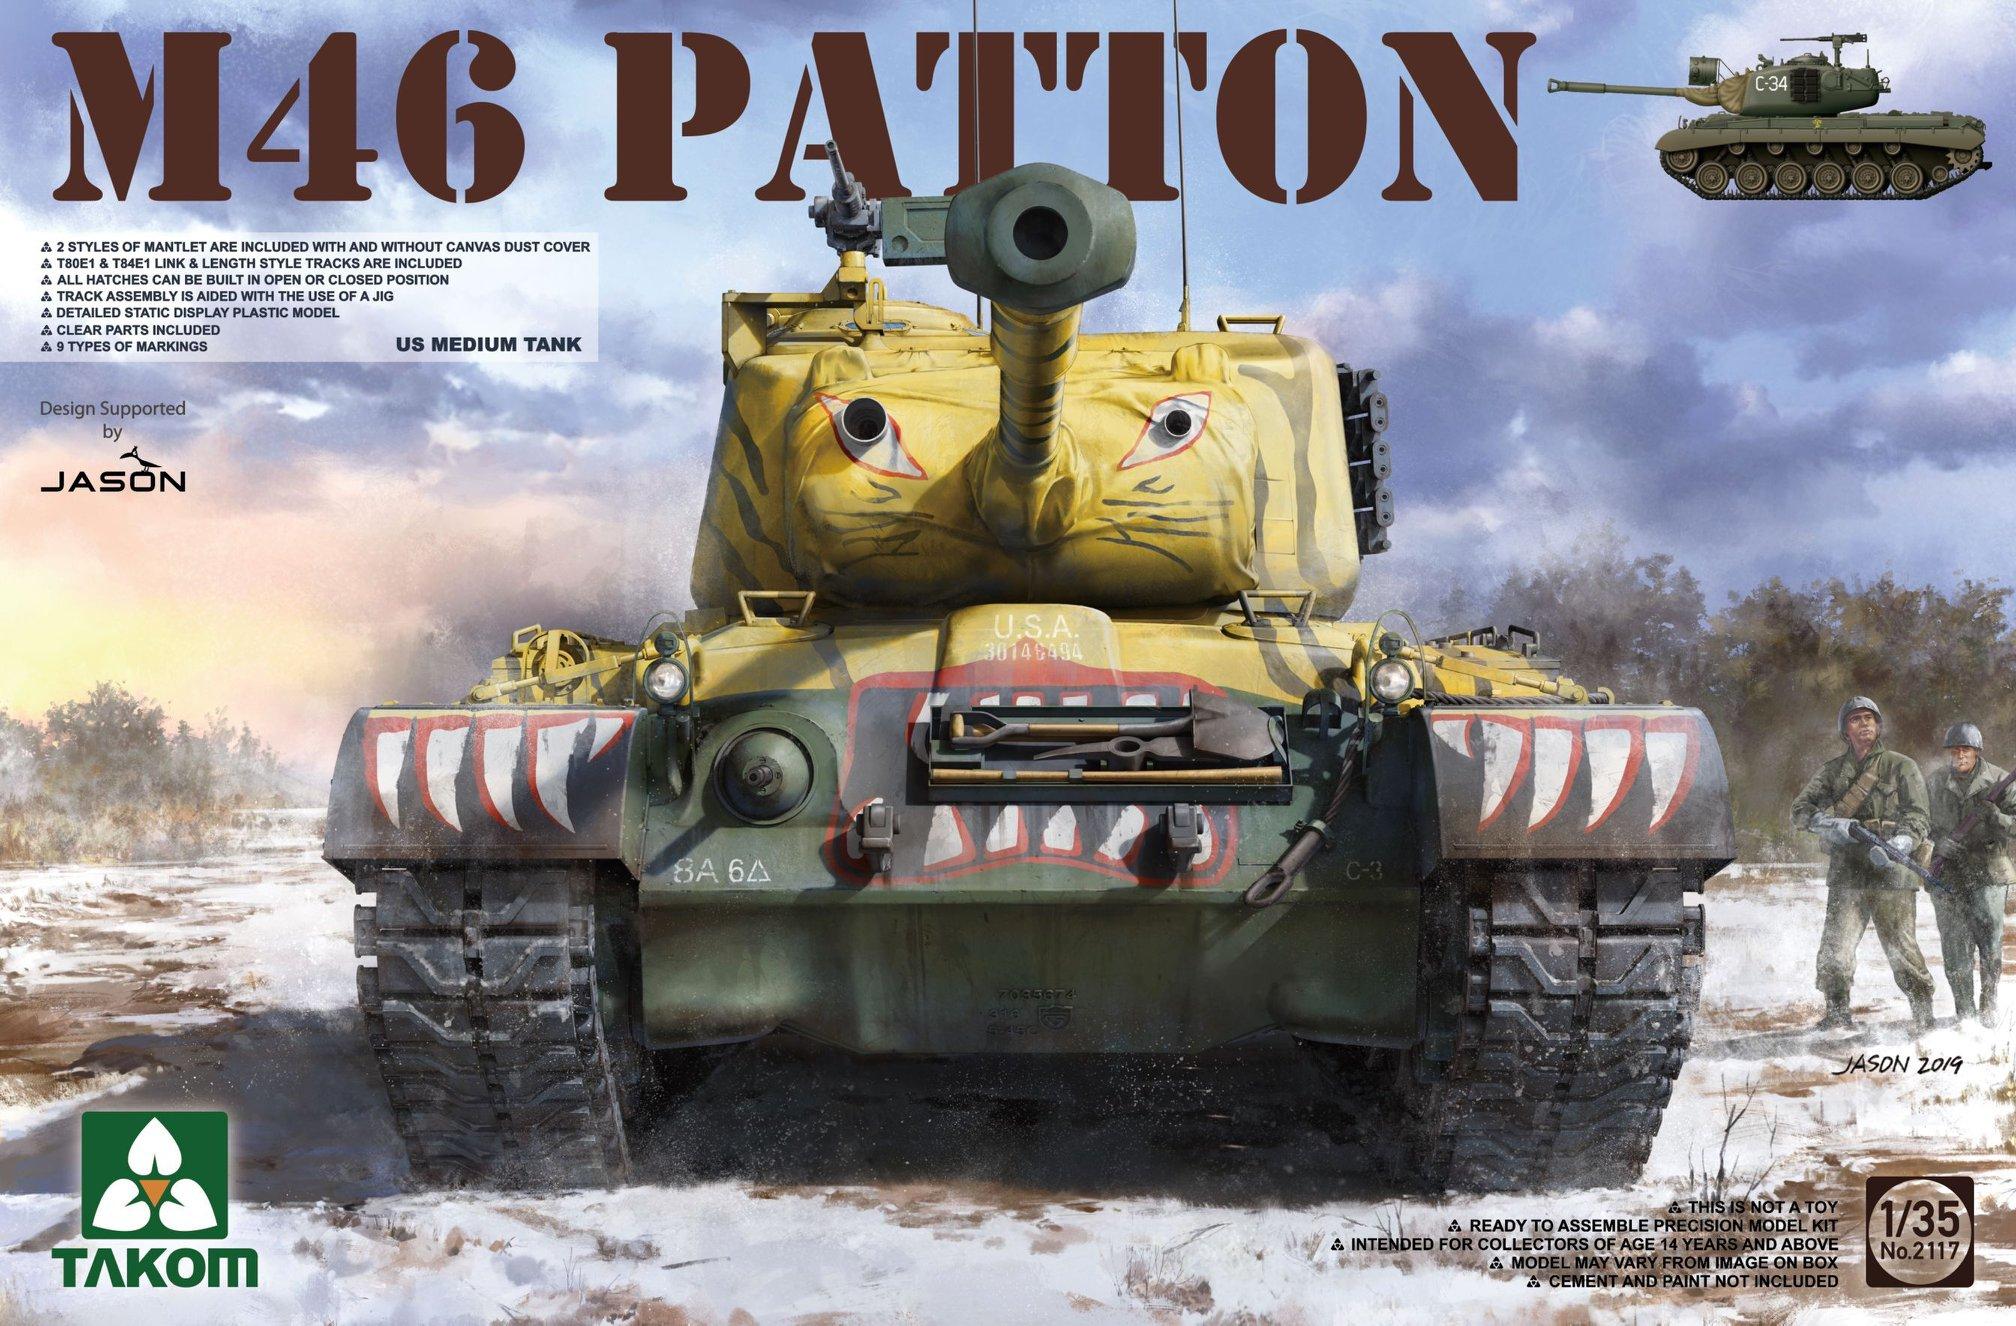 TAKOM # 2117 M46 PATTON.jpg